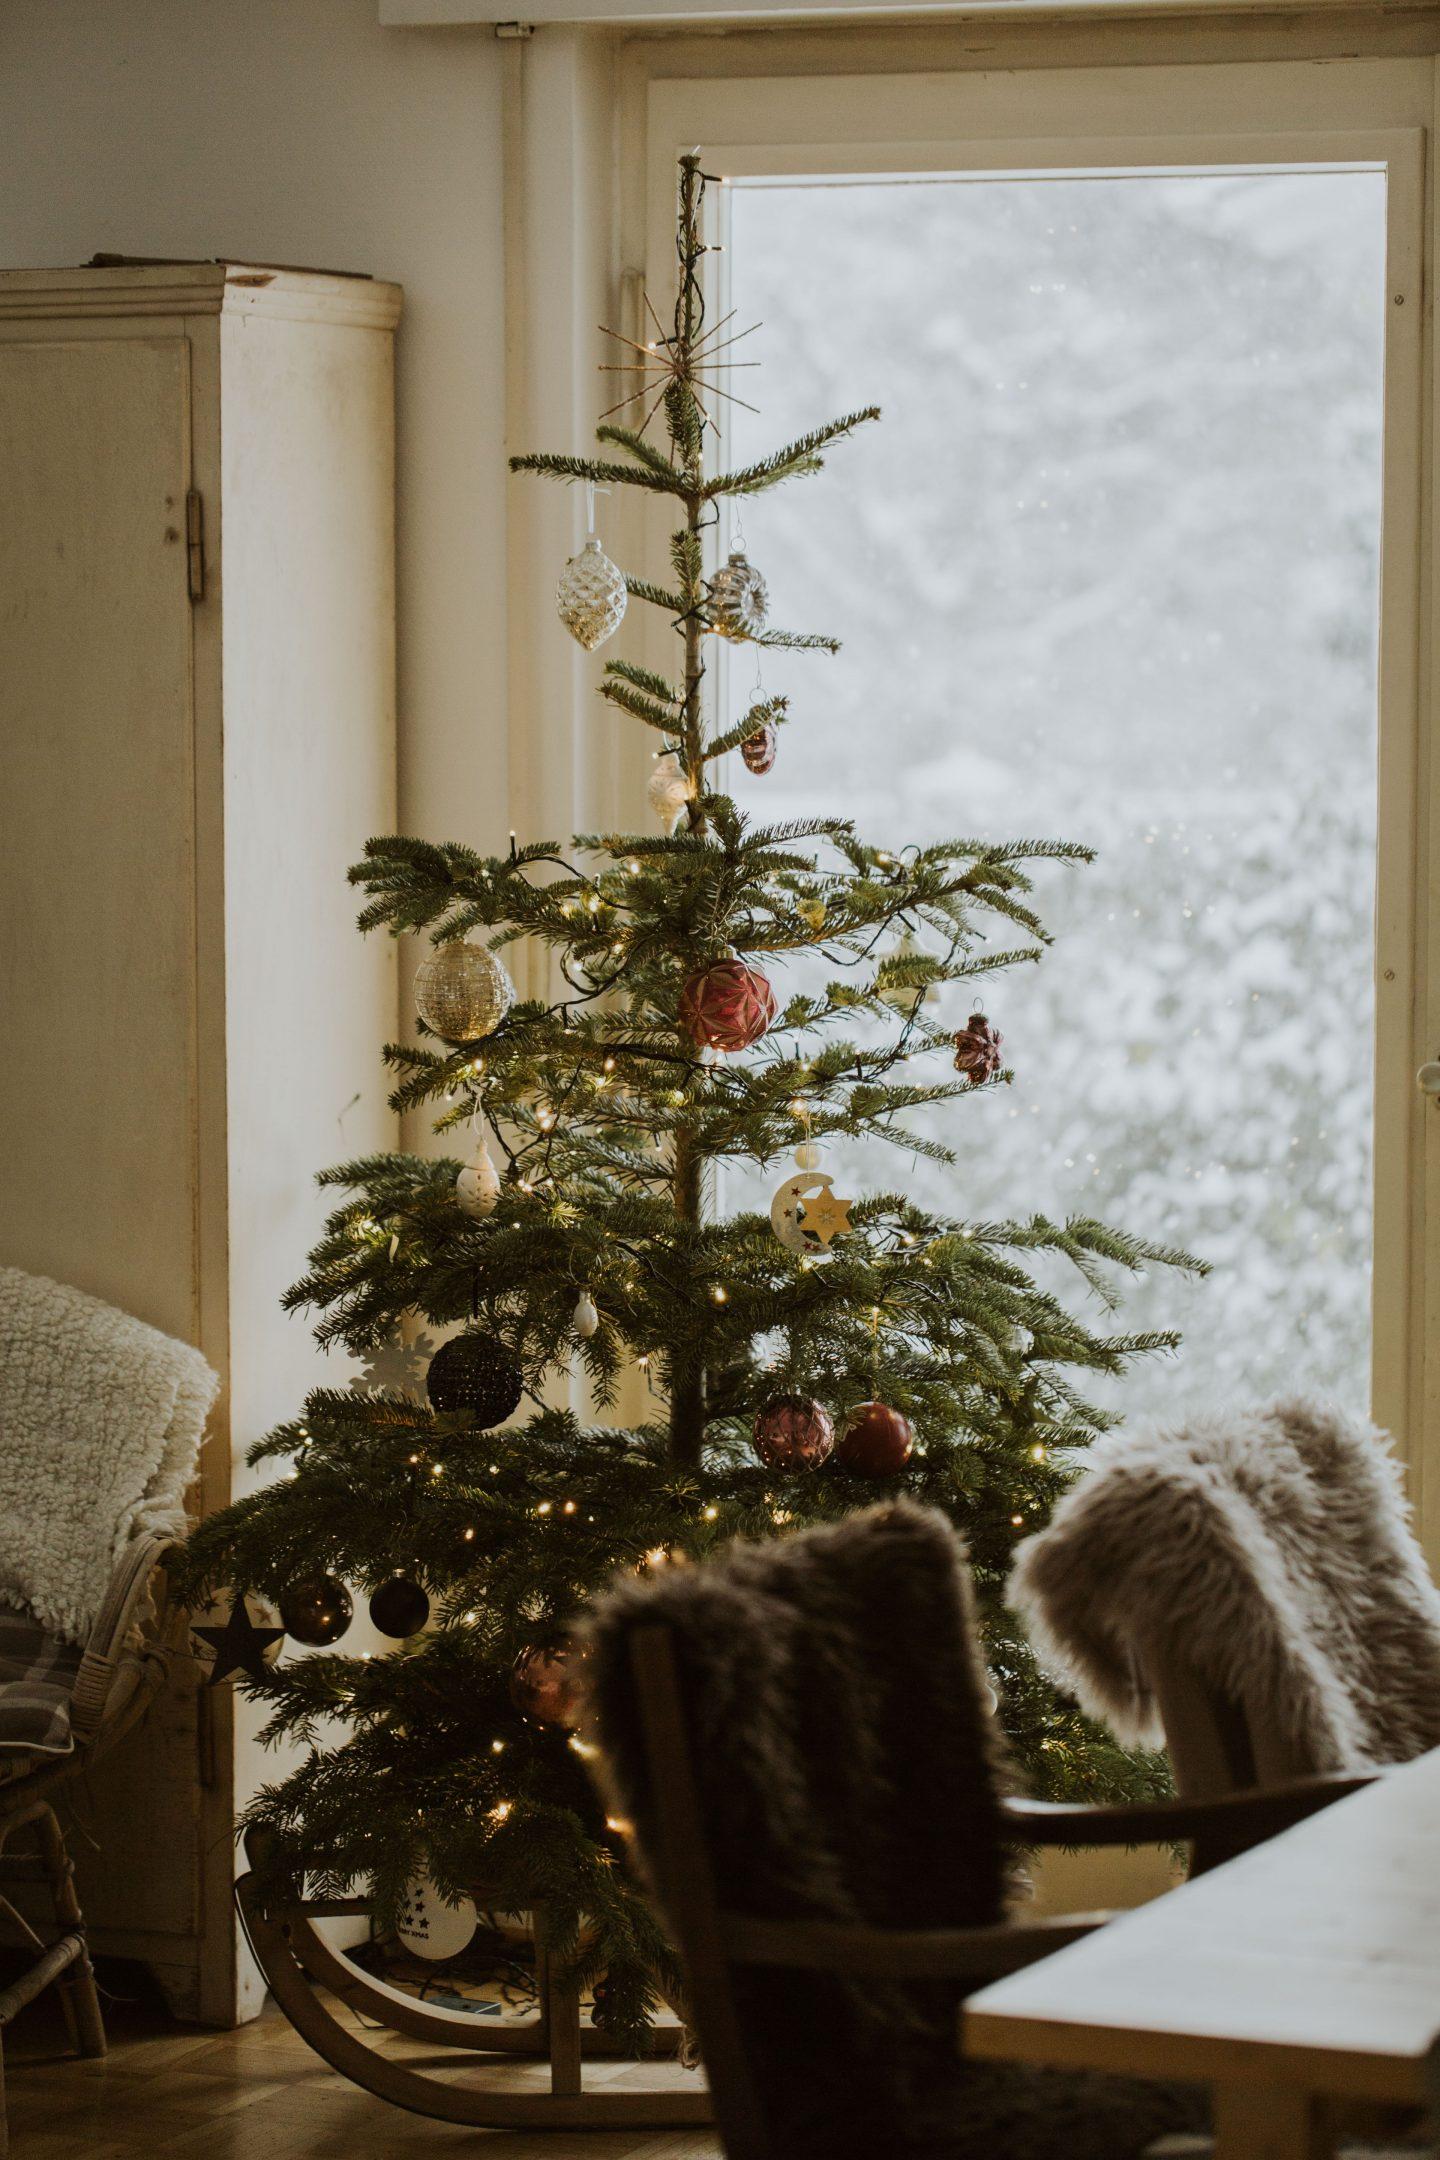 Minimal Christmas Decor from Etsy